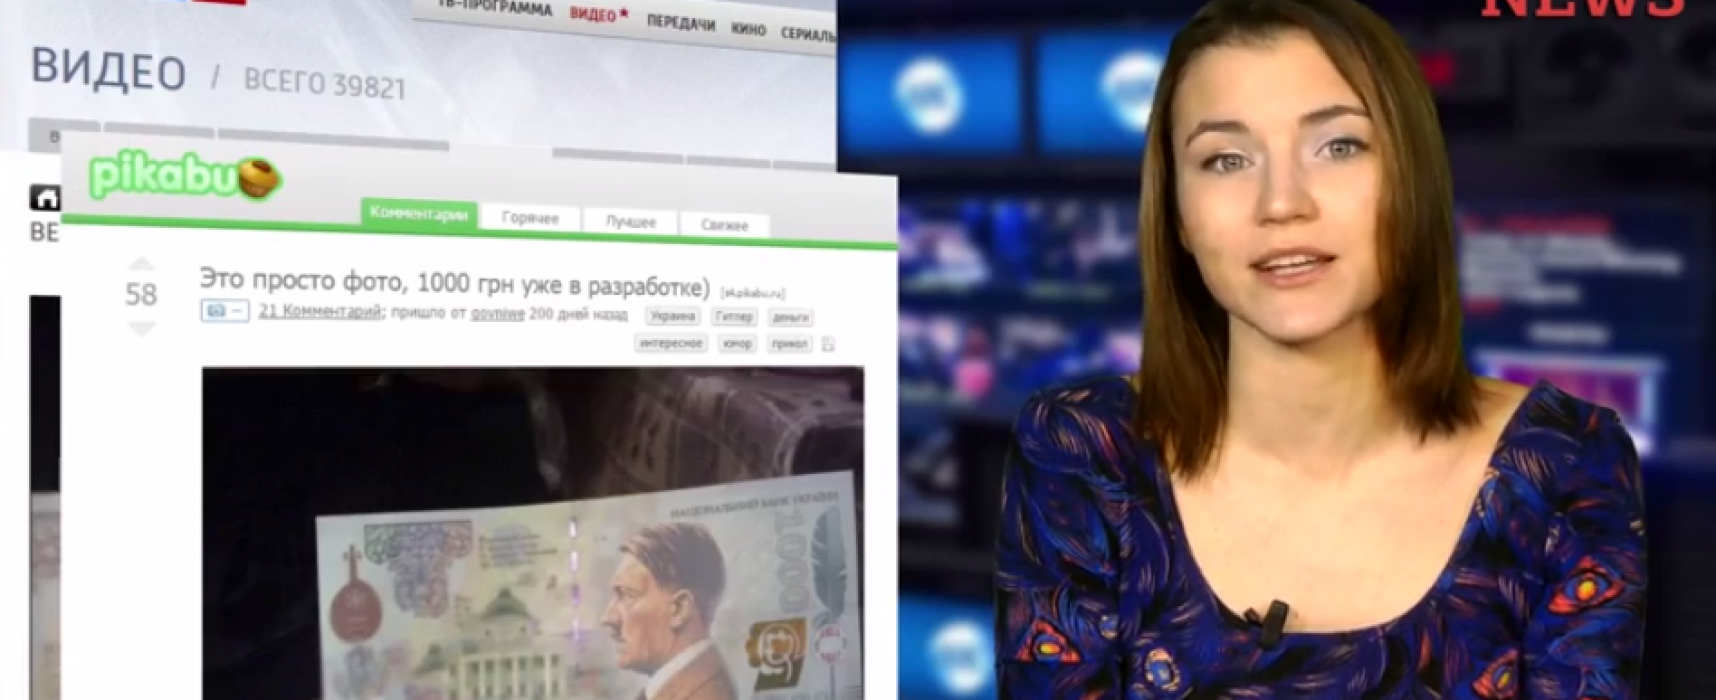 Видеодайджест StopFakeNews #53. ТОП-10 абсурдных фейков